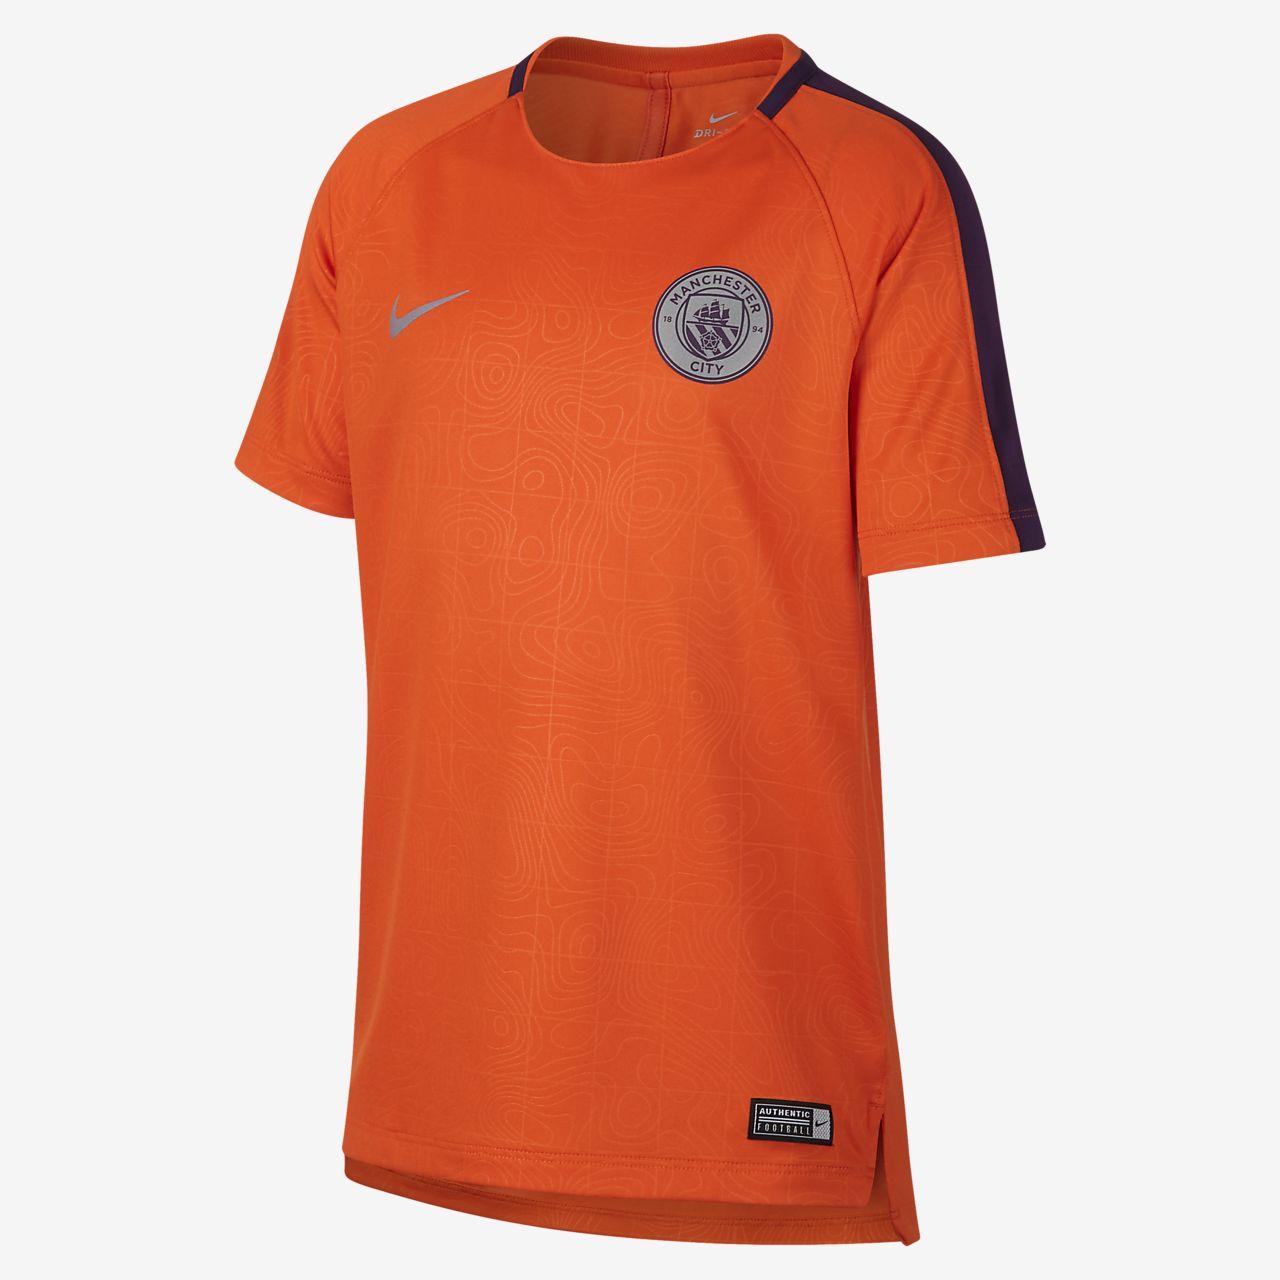 Top de fútbol para niños talla grande Manchester City FC Dri-FIT Squad